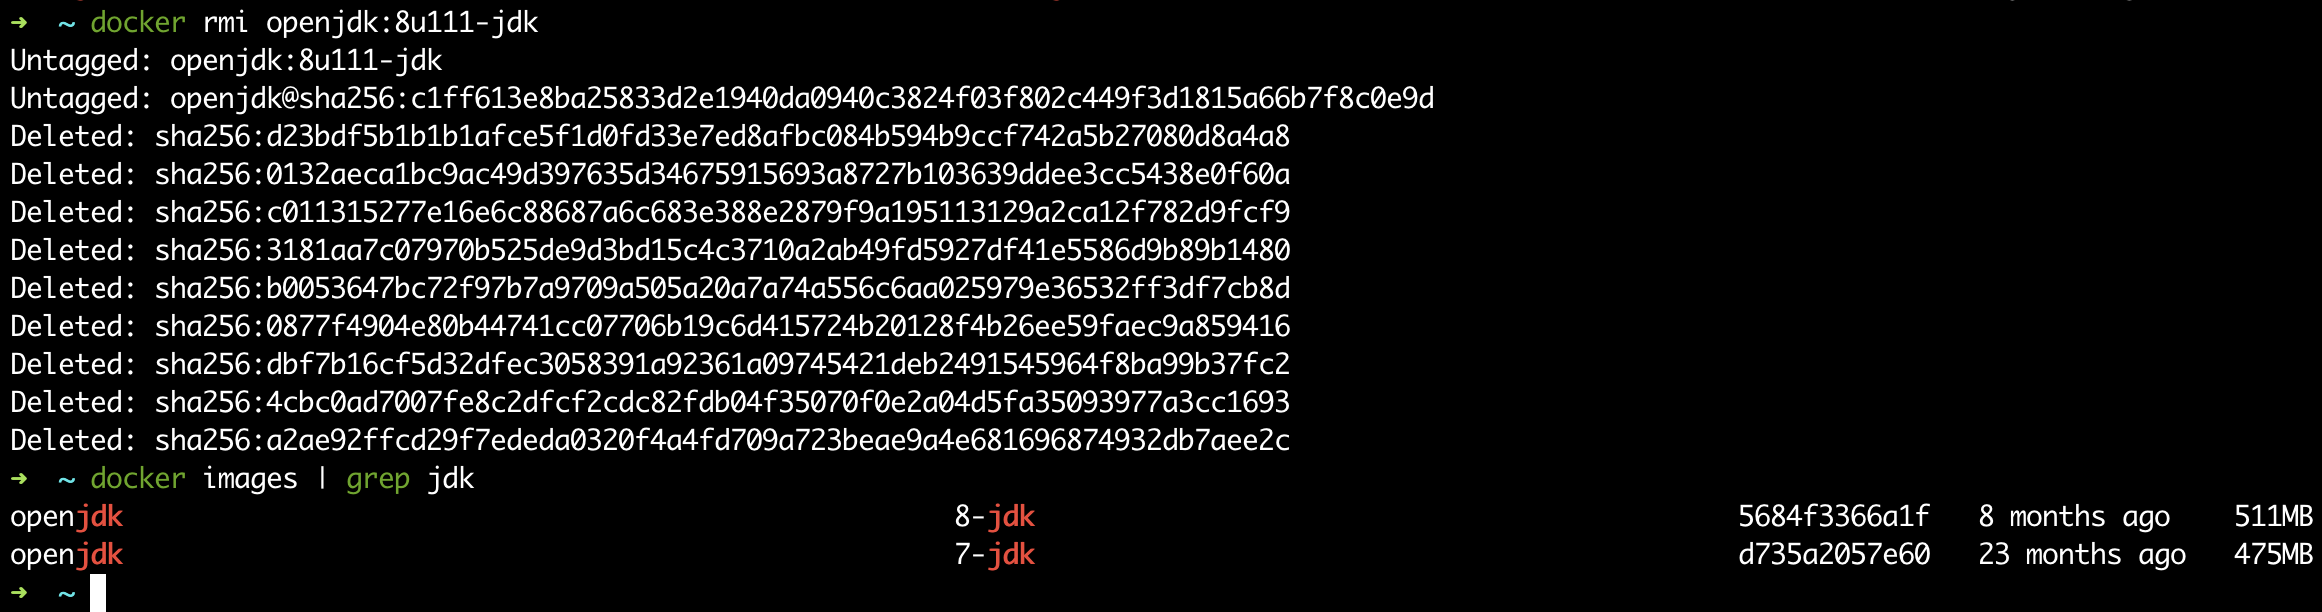 删除(openjdk:8u111-jdk)镜像